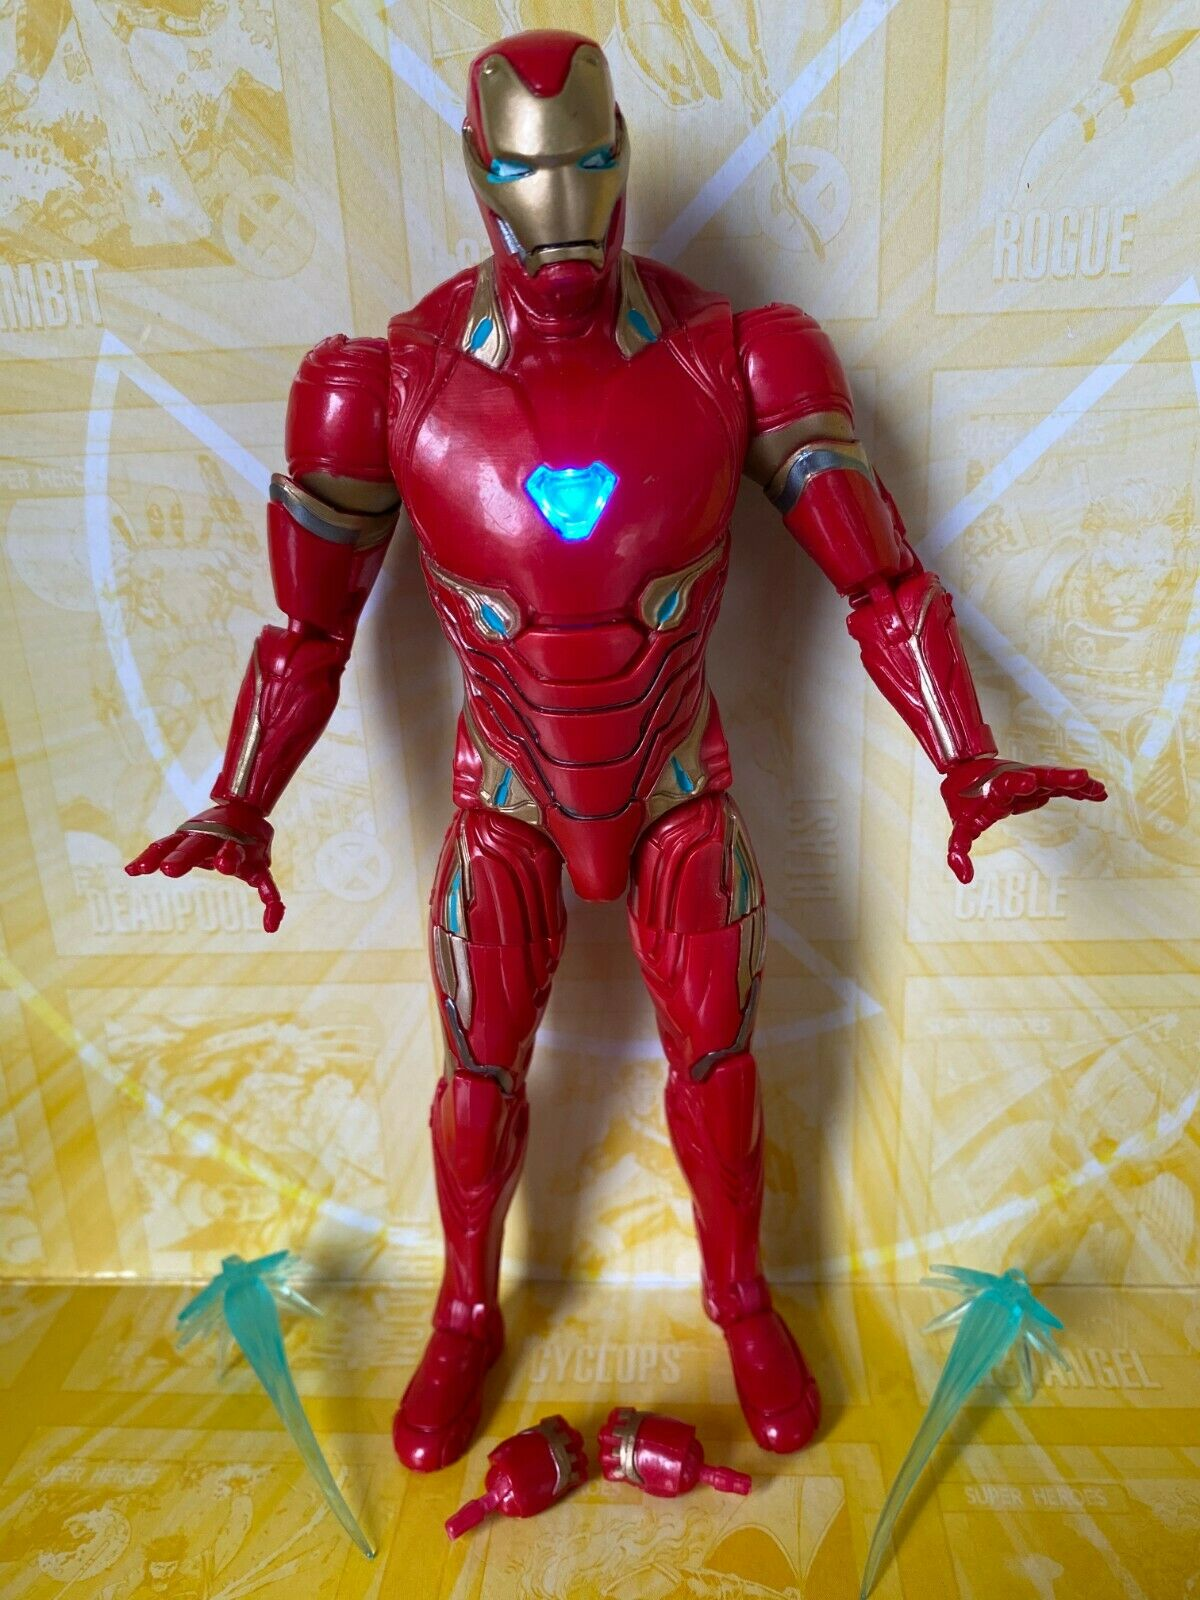 Marvel Legends Hasbro Studios Infinity Wars Iron Man LIGHT UP Action Figure (T5) on eBay thumbnail